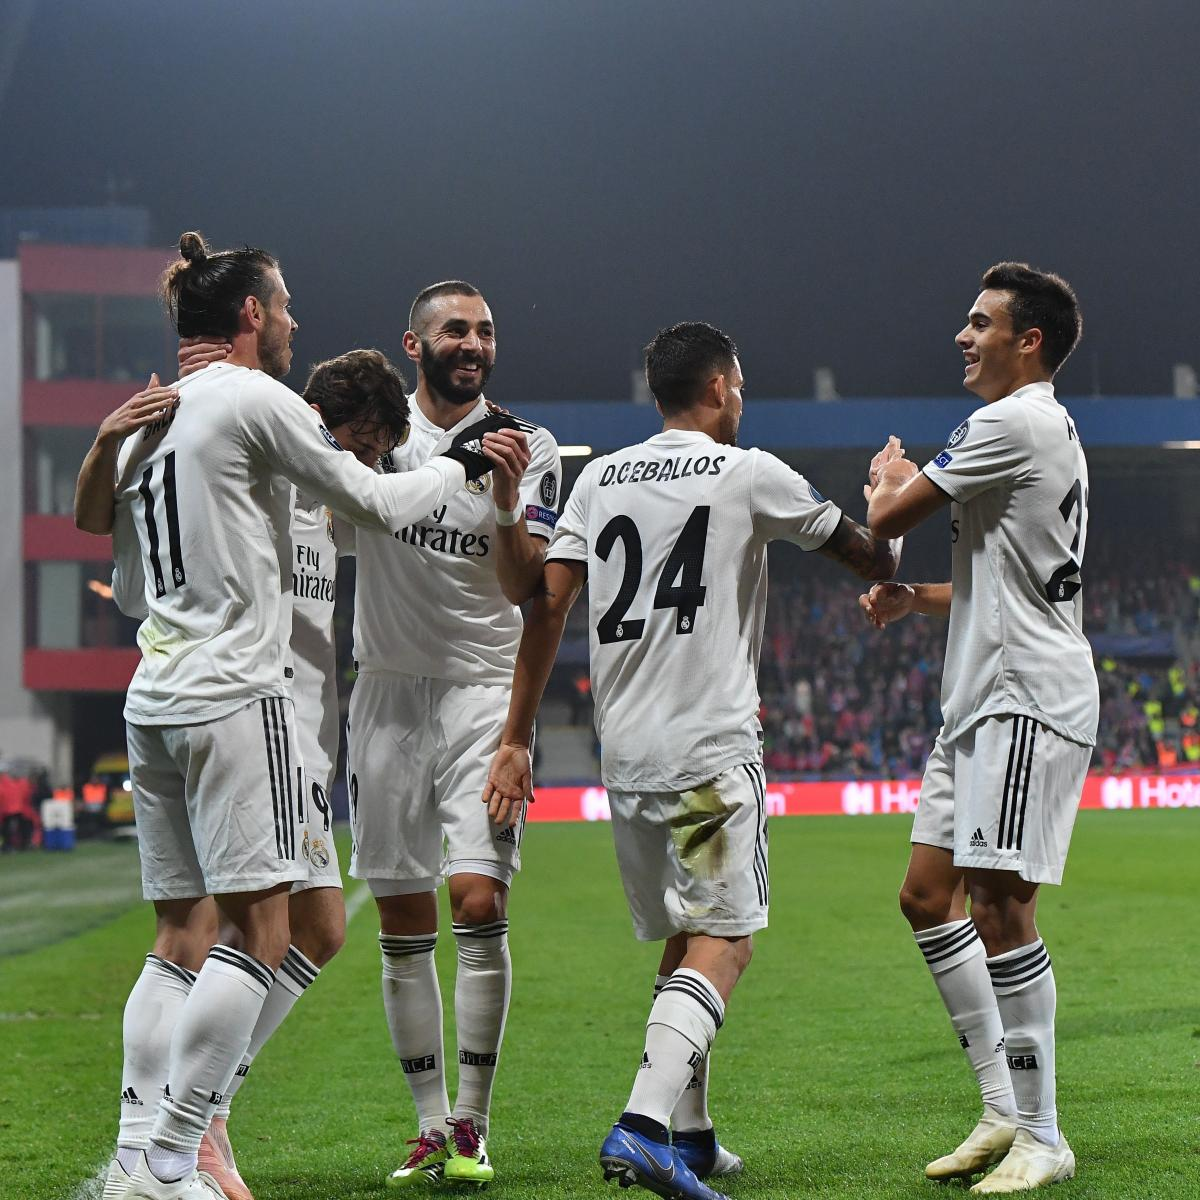 Celta Vigo Vs Barcelona Predictions Today: Celta Vigo Vs. Real Madrid: Odds, Preview, Live Stream, TV